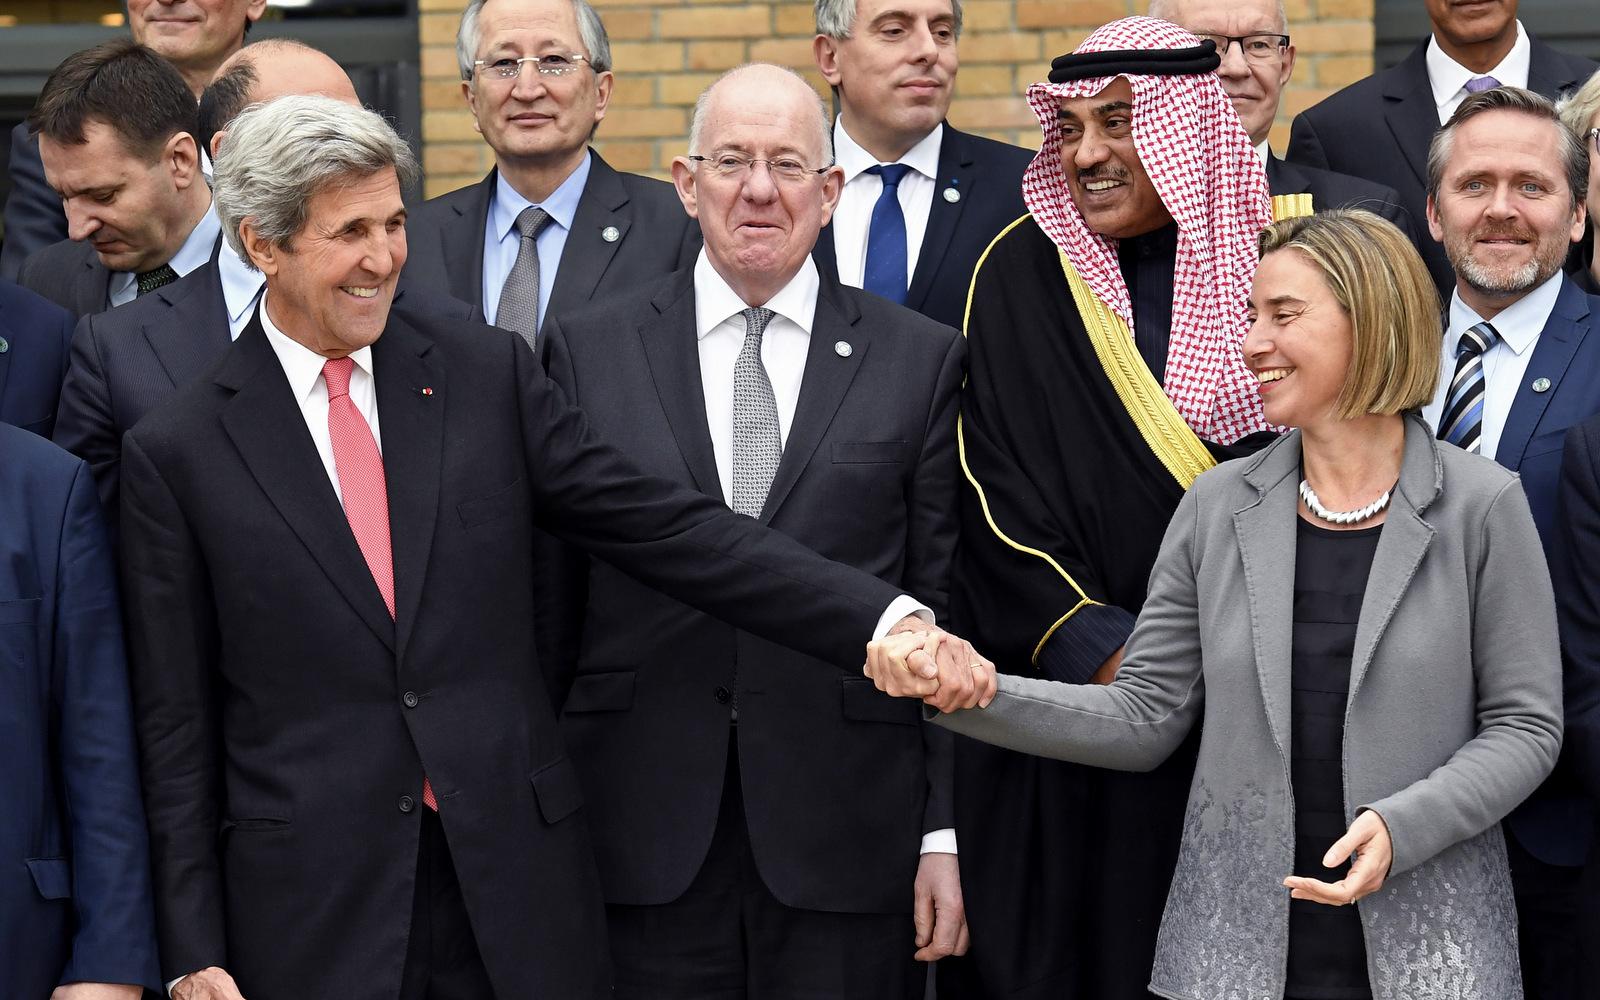 UK Blocks EU Support For Israel-Palestine Peace Talks